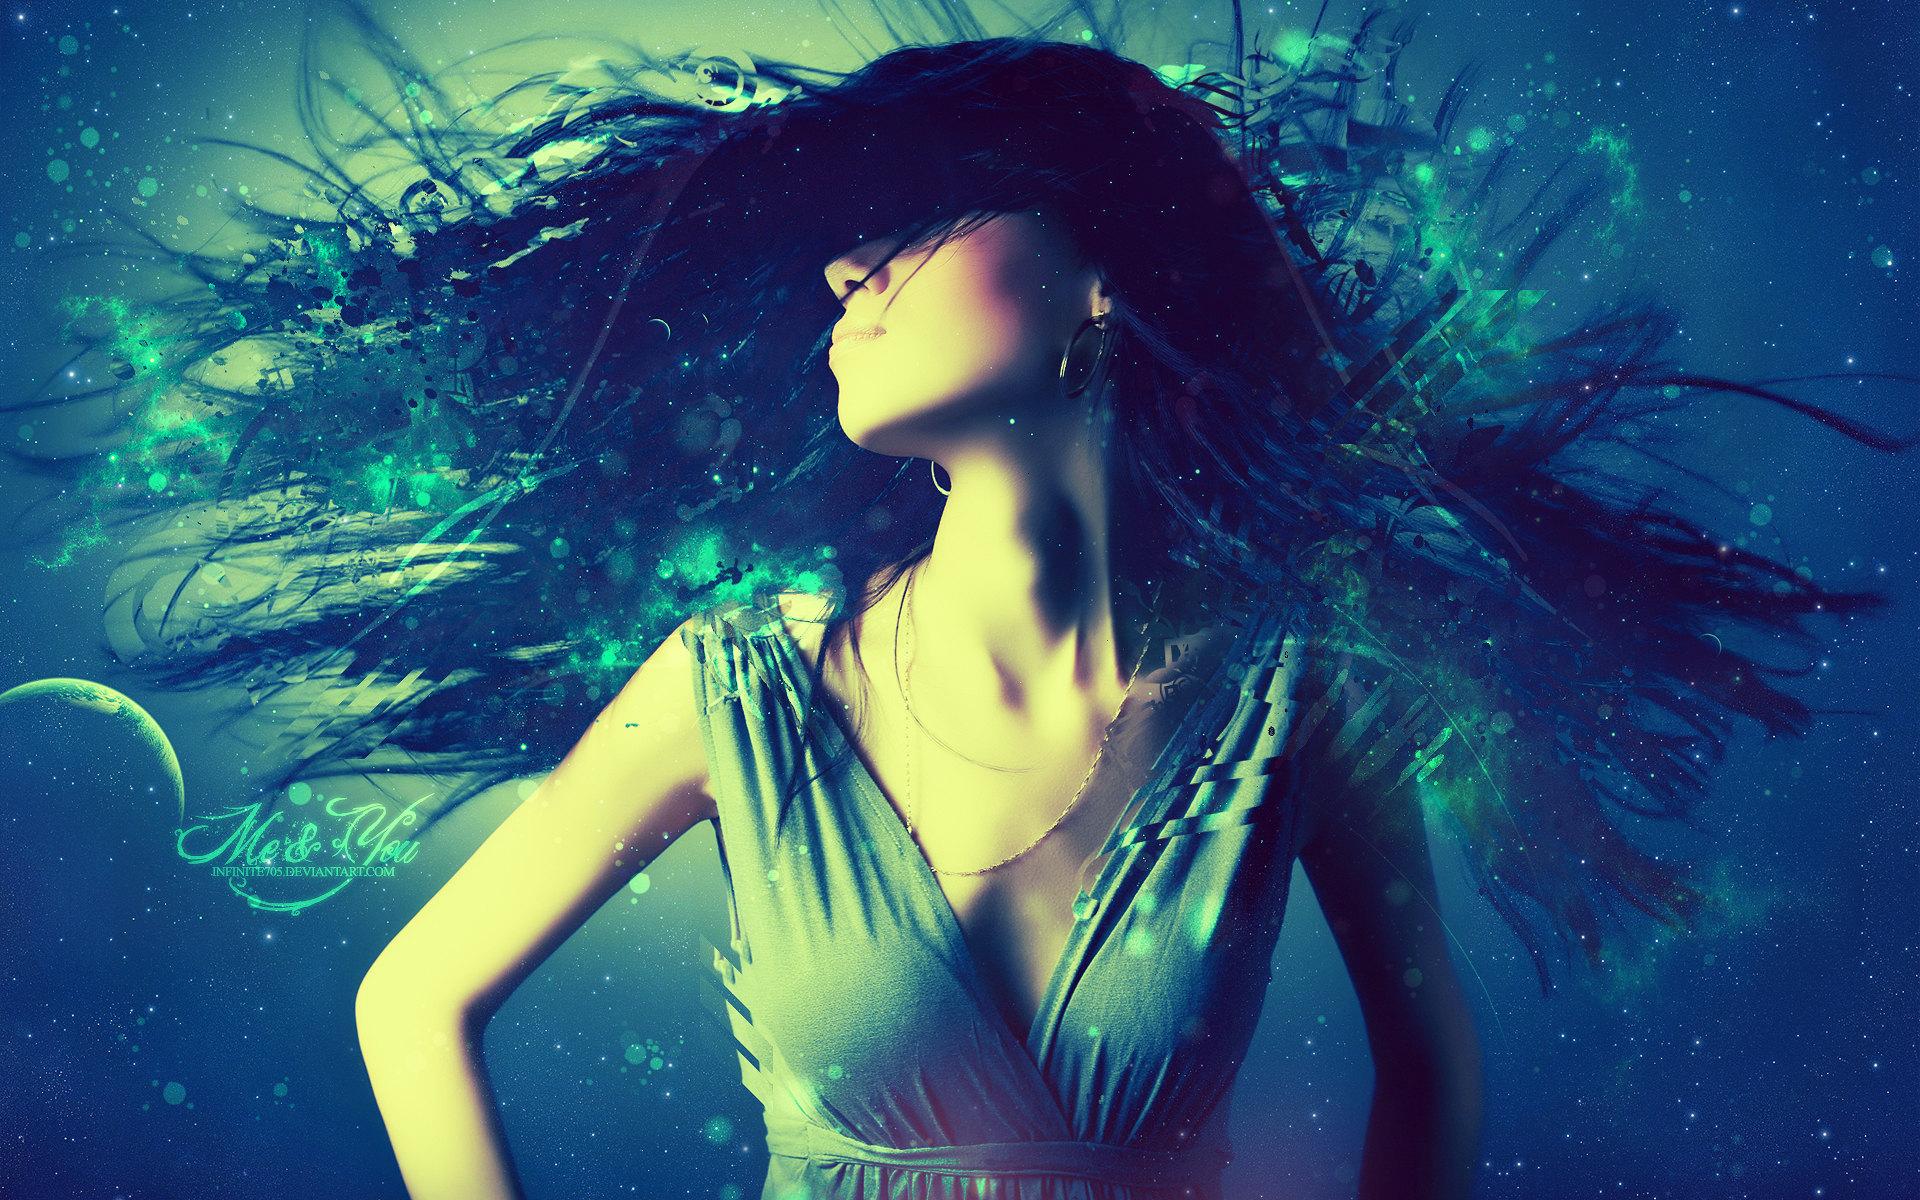 Artistic - Women  Abstract Dance Trance Girl Blue Music Wallpaper